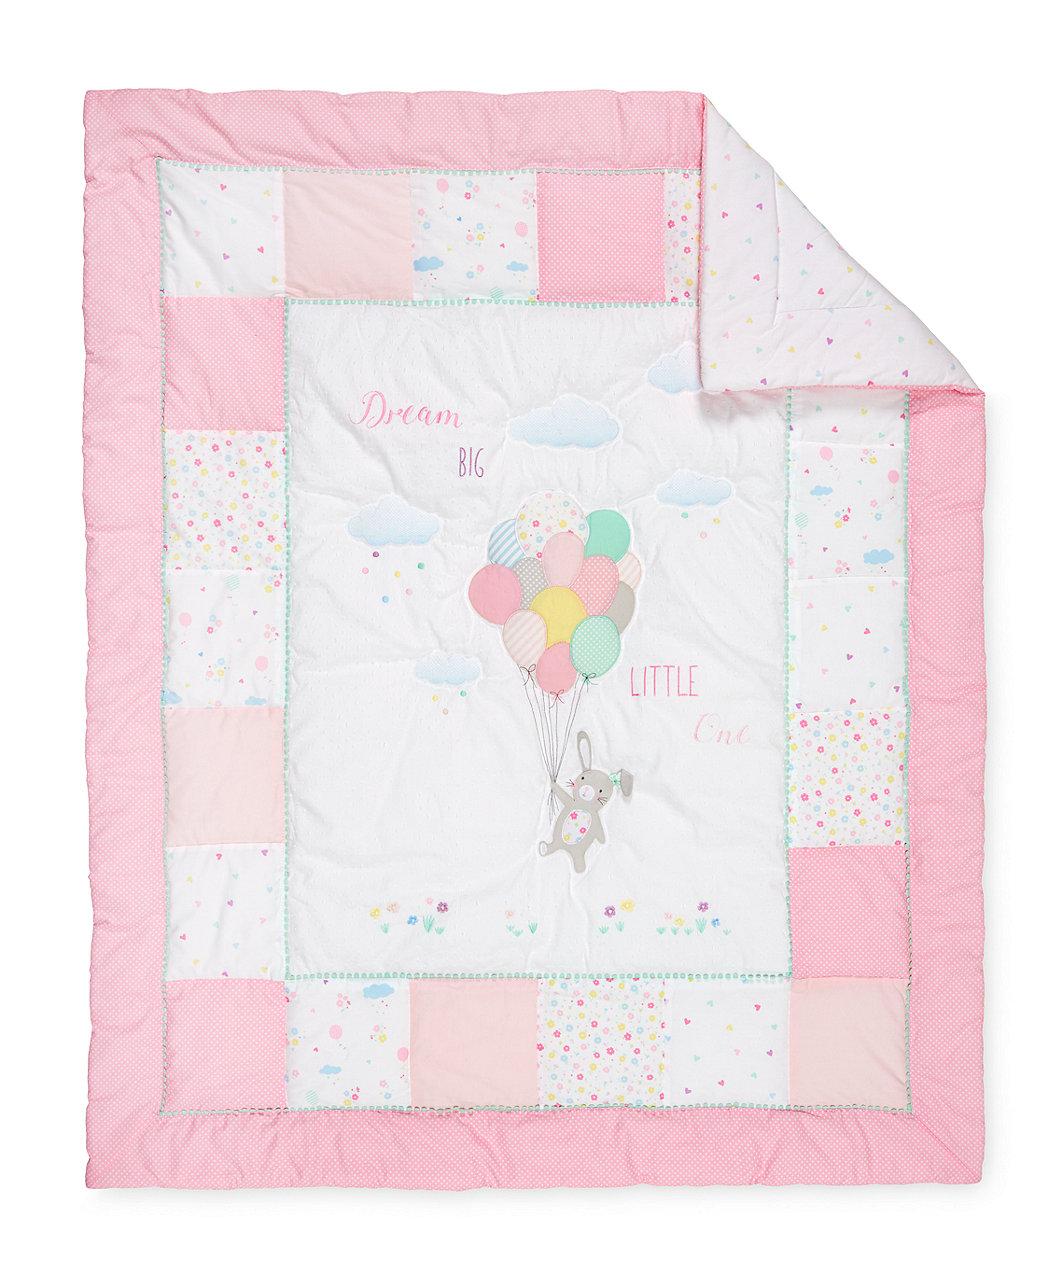 confetti party quilt. Loading zoom 28f33e55d8e8d